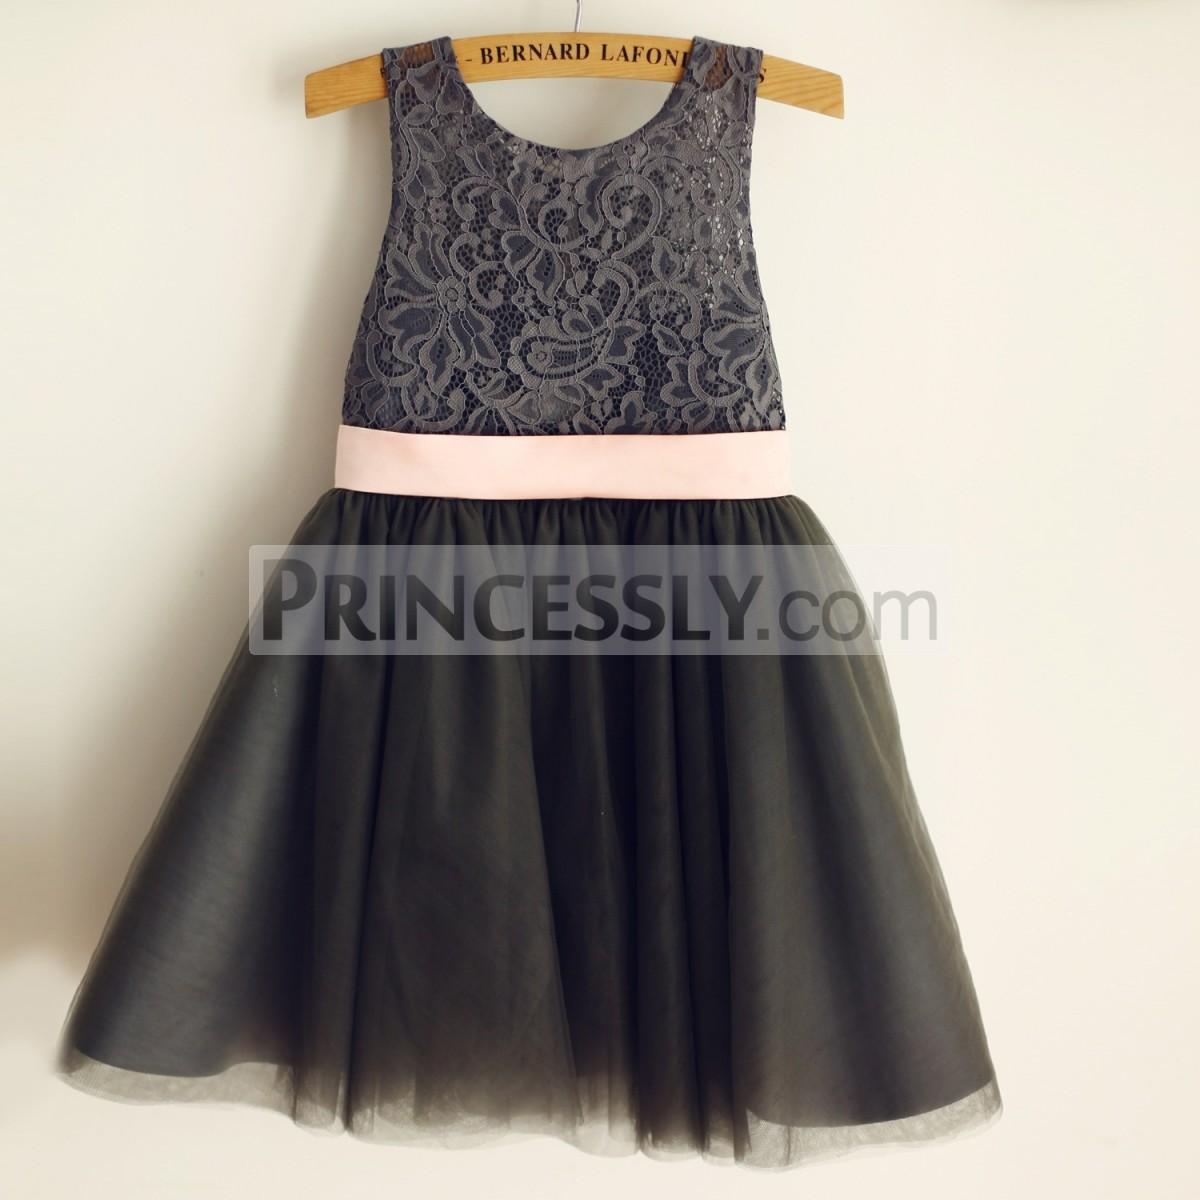 Princessly.com-K1003970-Gray Lace Tulle Wedding Flower Girl Dress with Pink Belt-31